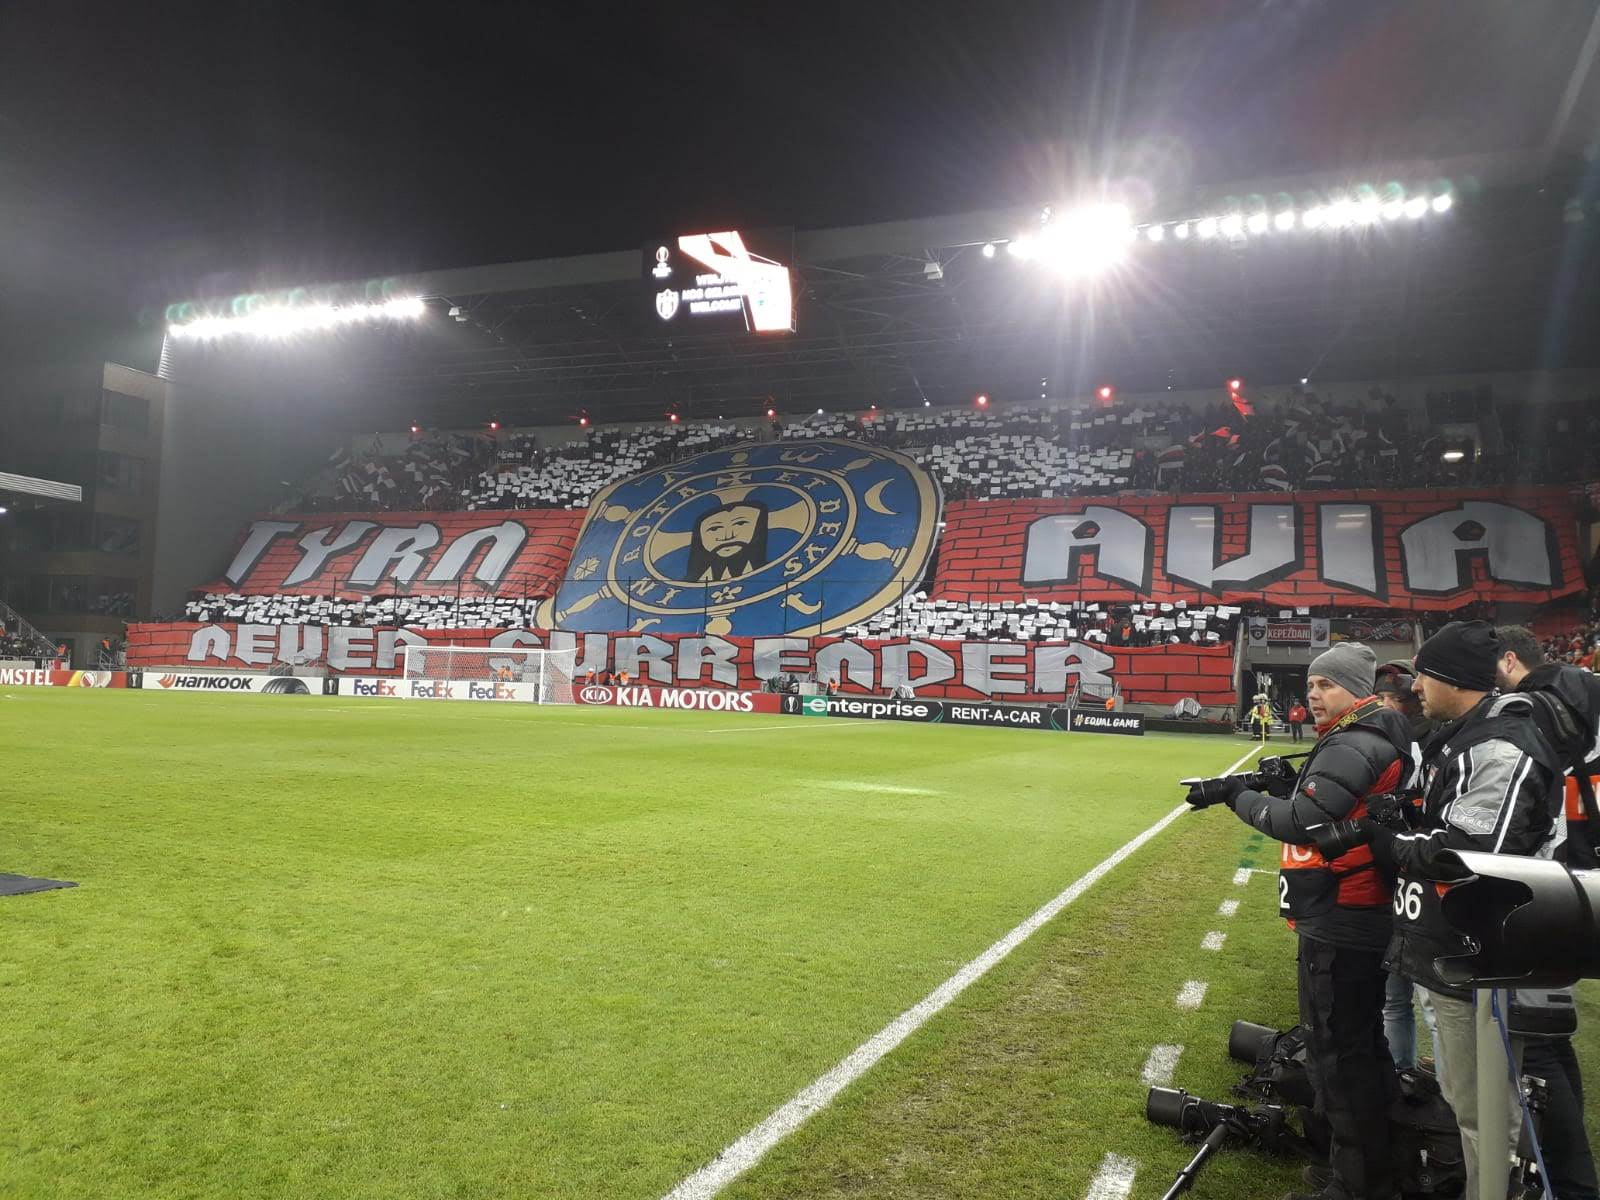 Fanúšikovia Spartak Trnava